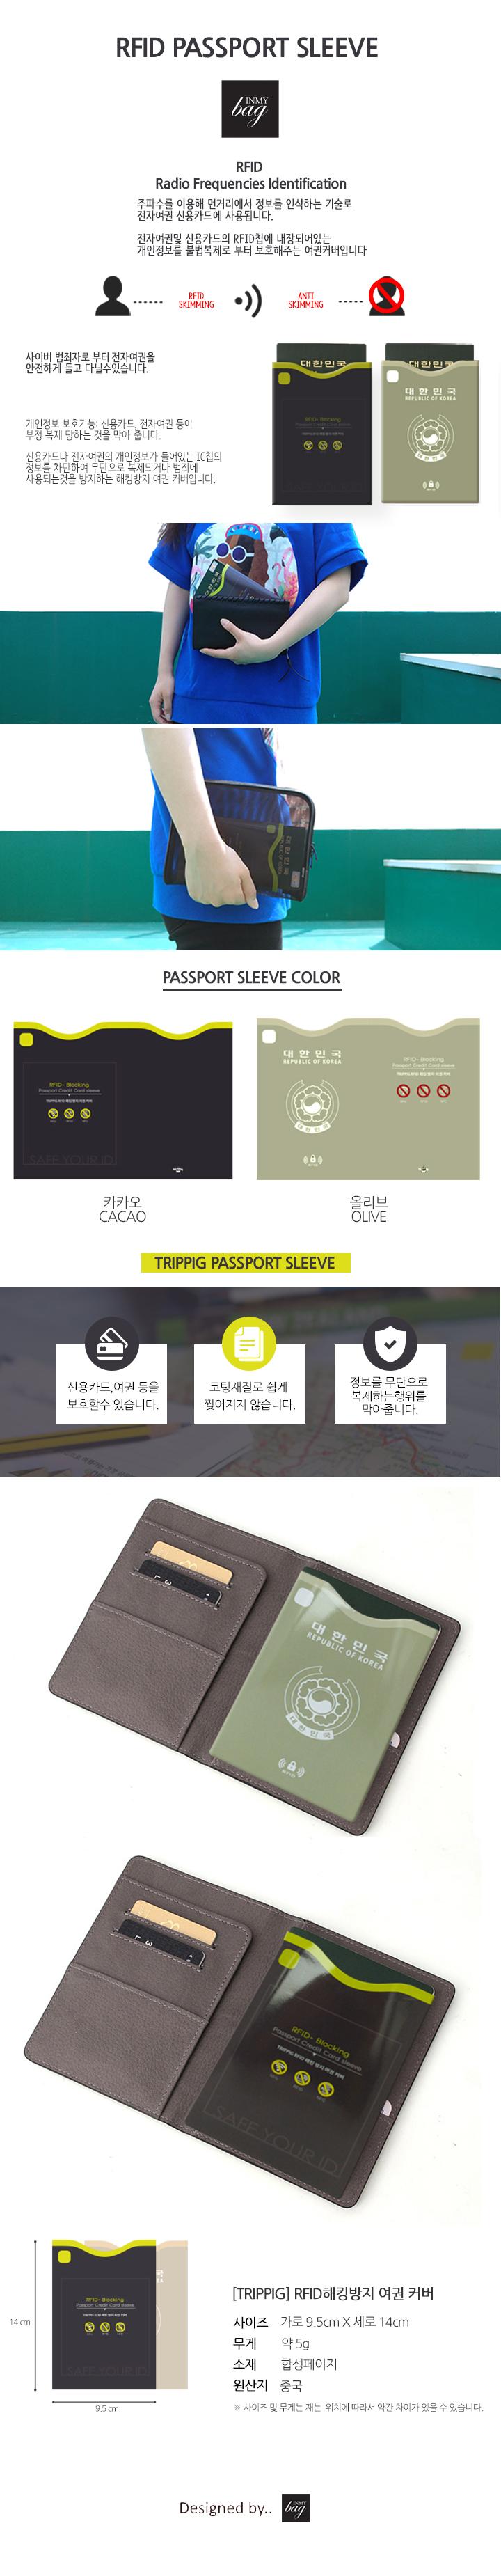 PT 트리피그 RFID차단 슬리브 여권용 - 올리브2,000원-피트래블여행/레포츠, 여권/네임택, 여권케이스, 심플 케이스바보사랑PT 트리피그 RFID차단 슬리브 여권용 - 올리브2,000원-피트래블여행/레포츠, 여권/네임택, 여권케이스, 심플 케이스바보사랑